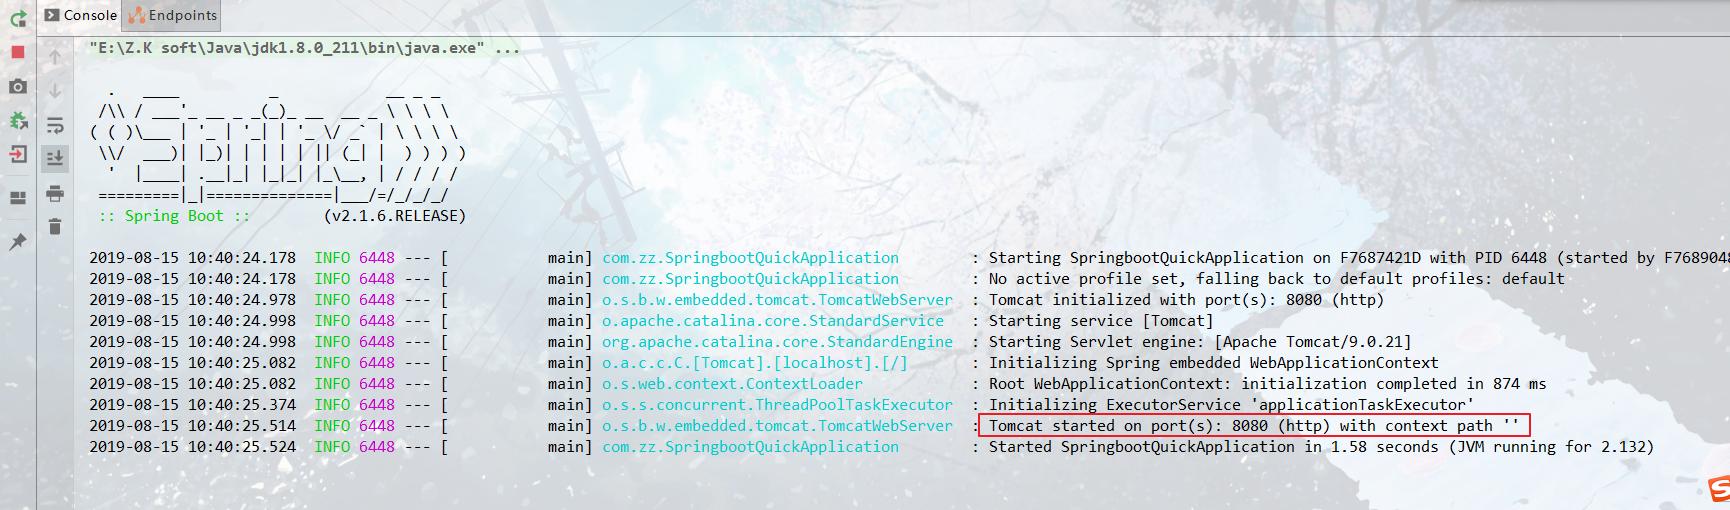 Springboot项目启动